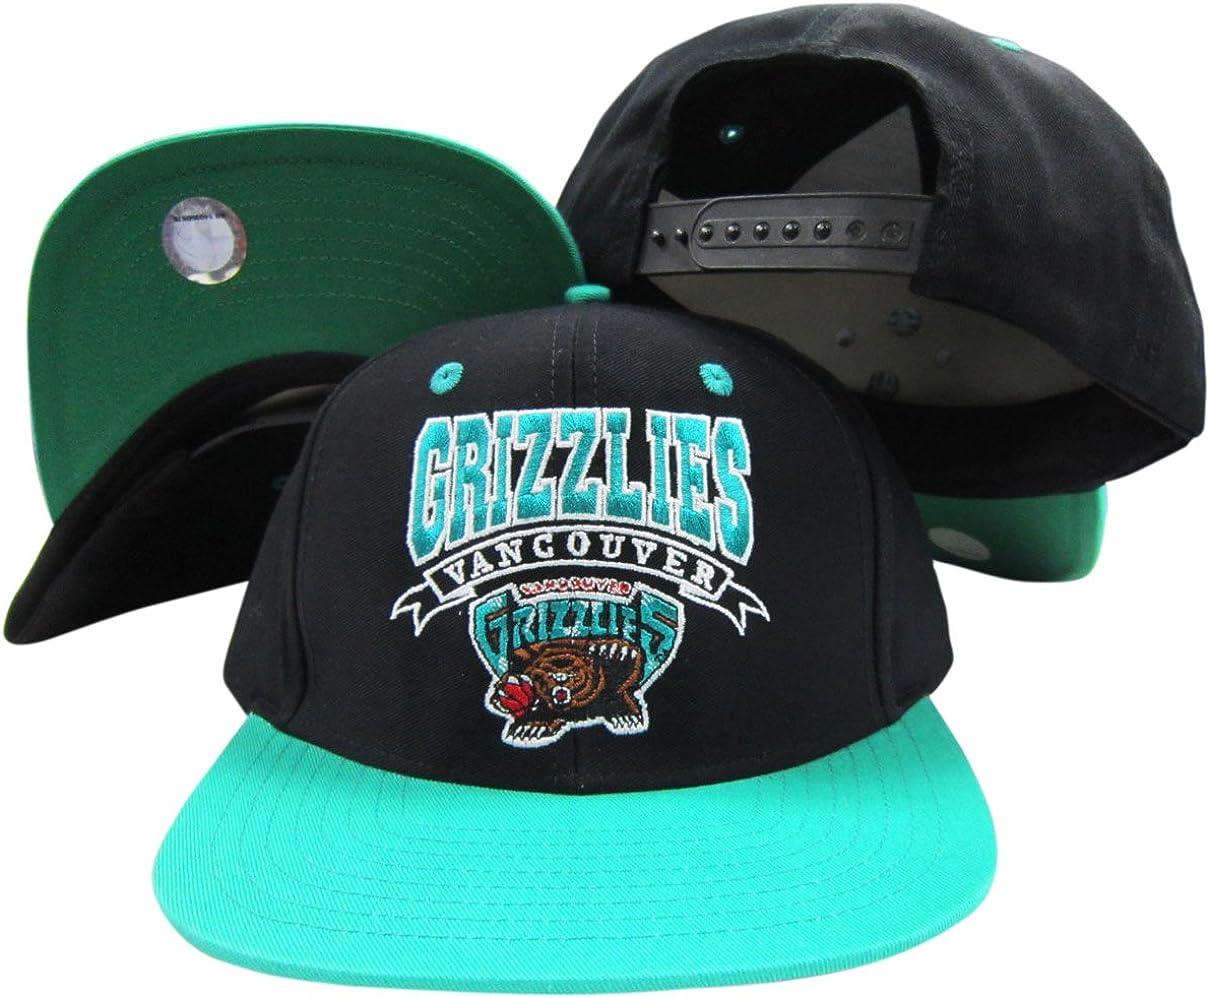 Vancouver Grizzlies Black/Teal Two Tone Snapback Adjustable Plastic Snap Back Hat/Cap